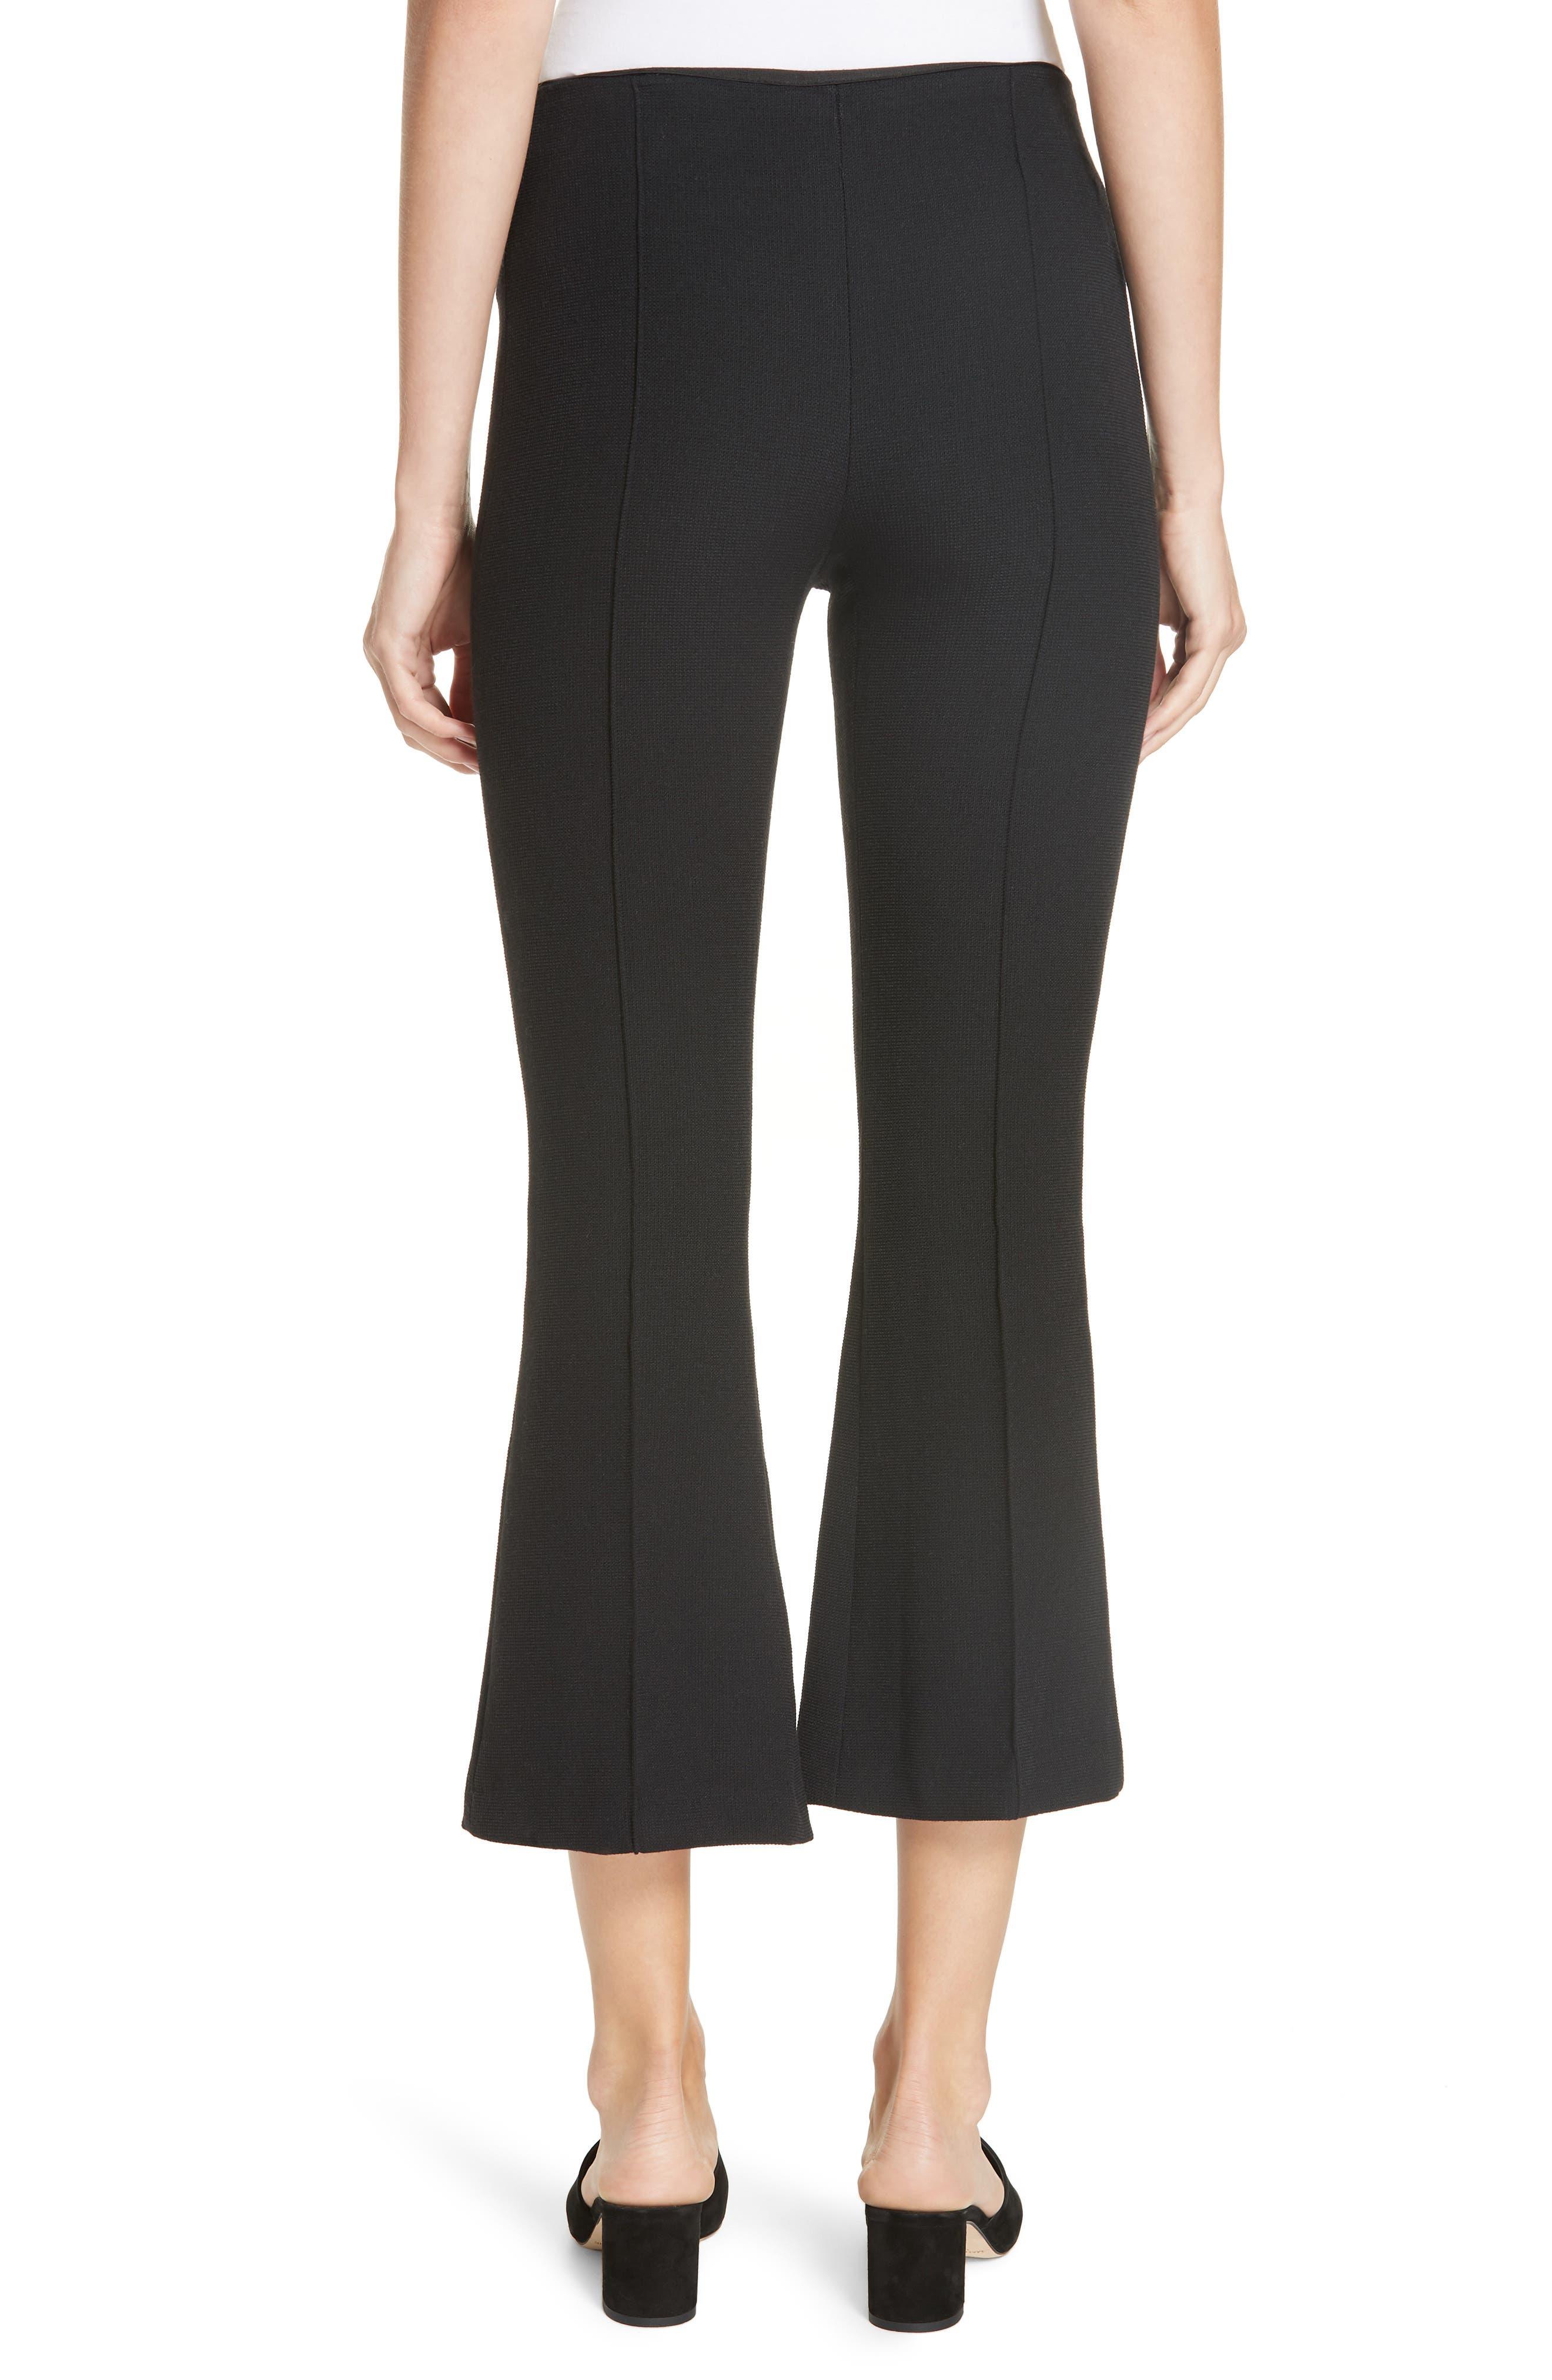 Pull-On Wool Blend Crop Flare Pants,                             Alternate thumbnail 2, color,                             BLACK PIQUE